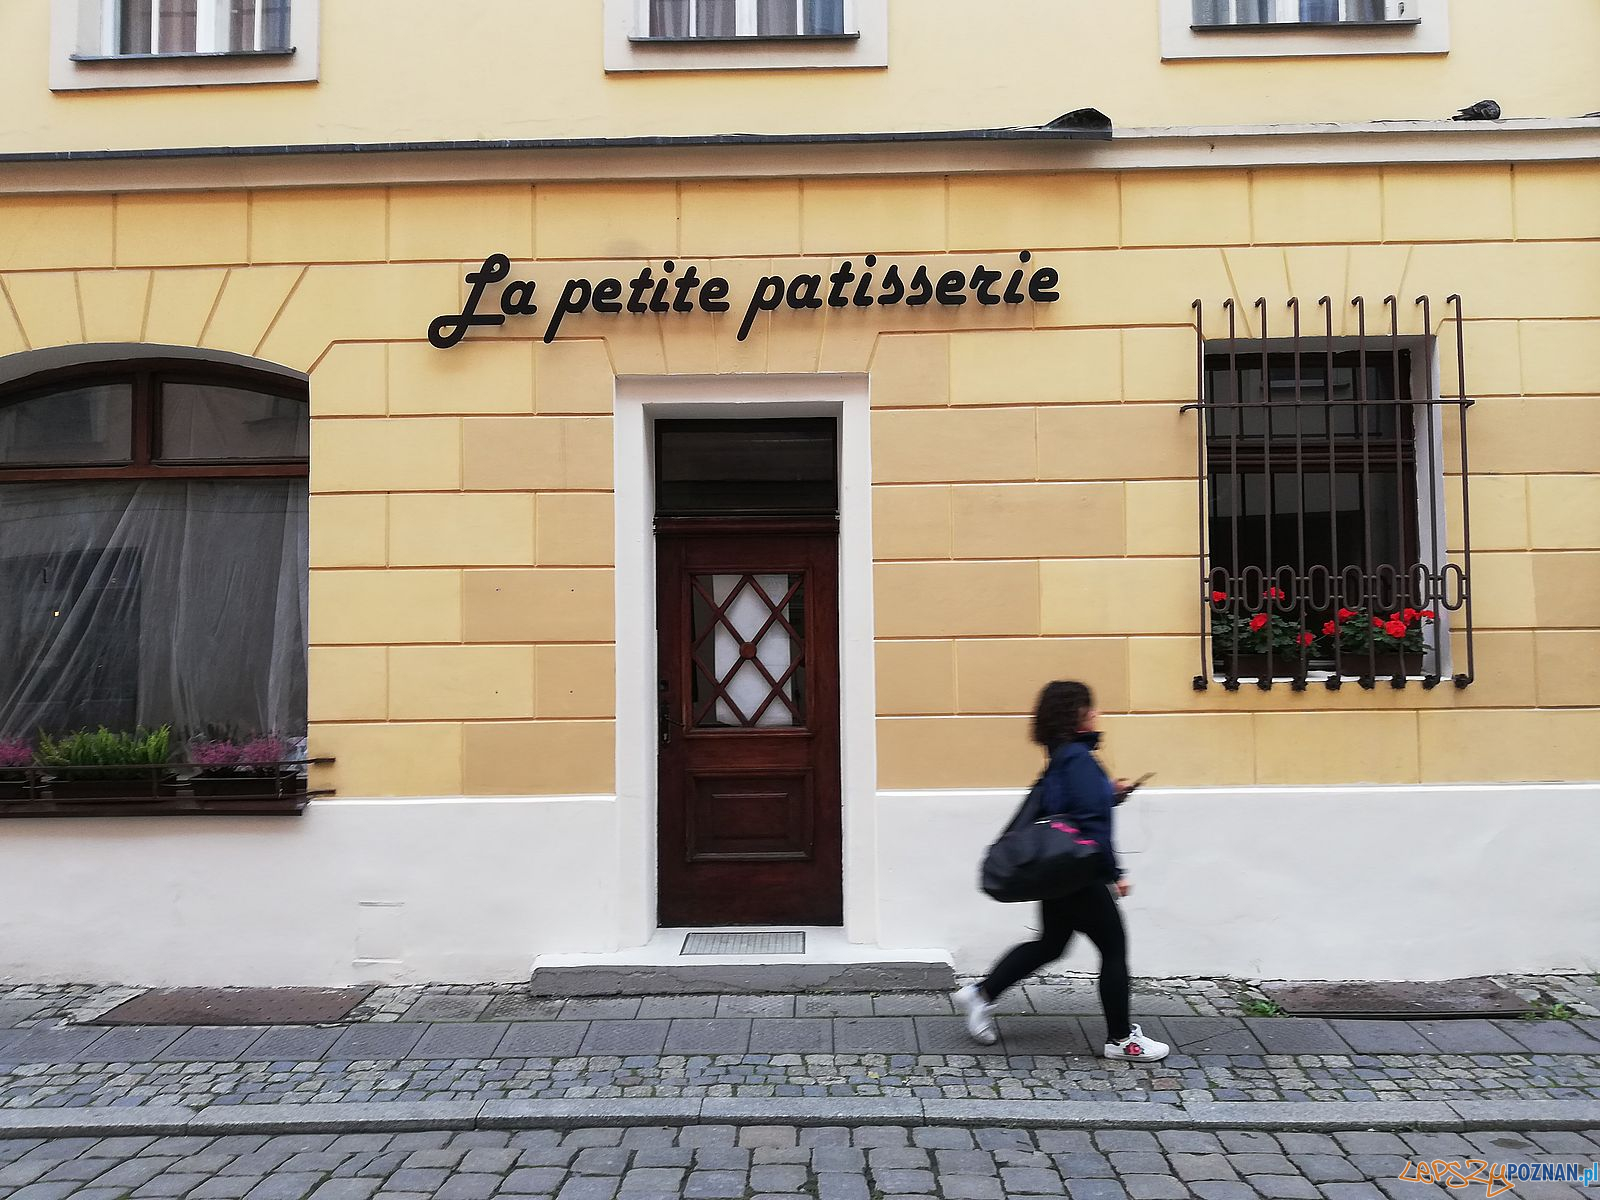 Le petite patisserie - Klasztorna / Wielka  Foto: Tomasz Dworek